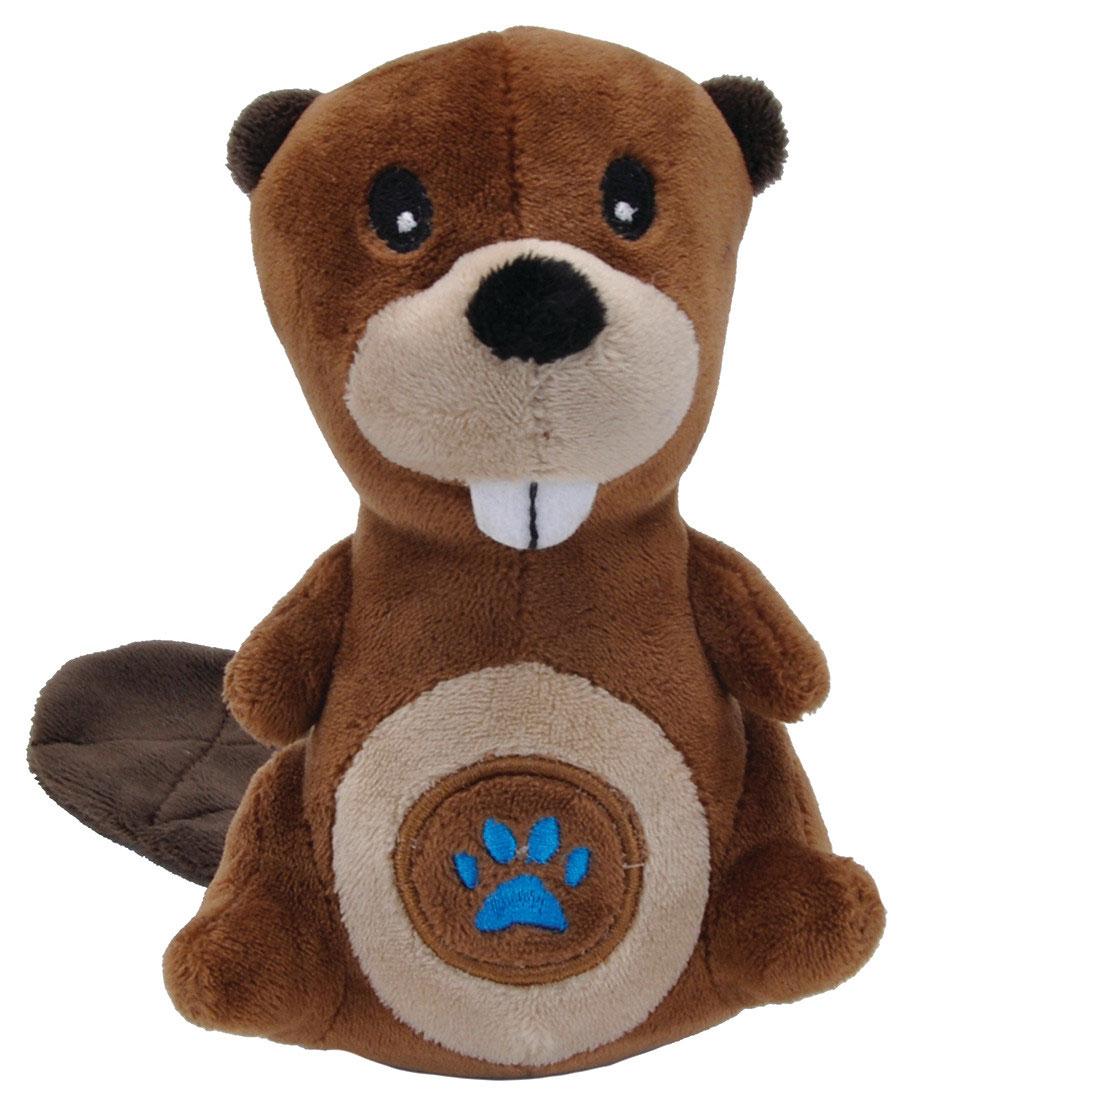 Li'l Pals Paw Beaver Plush Dog Toy, 5-in